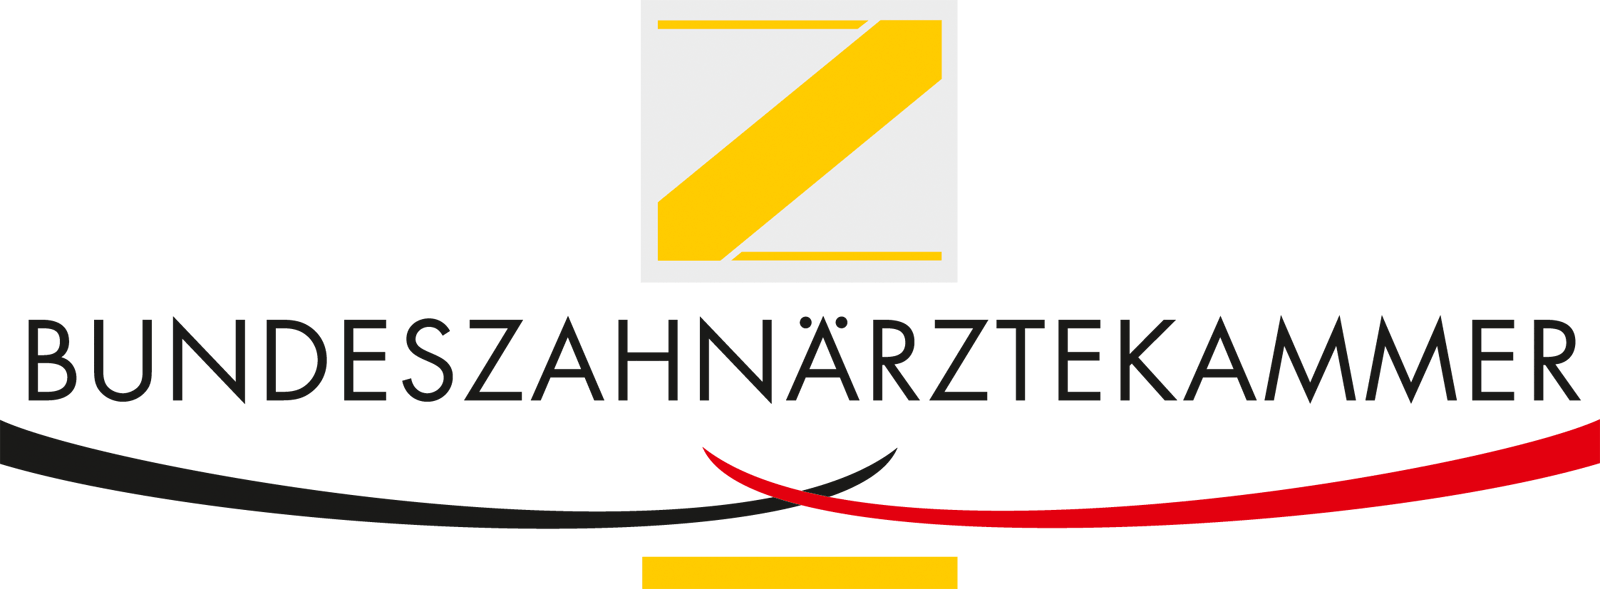 Bundeszahnaerztekammer Logo